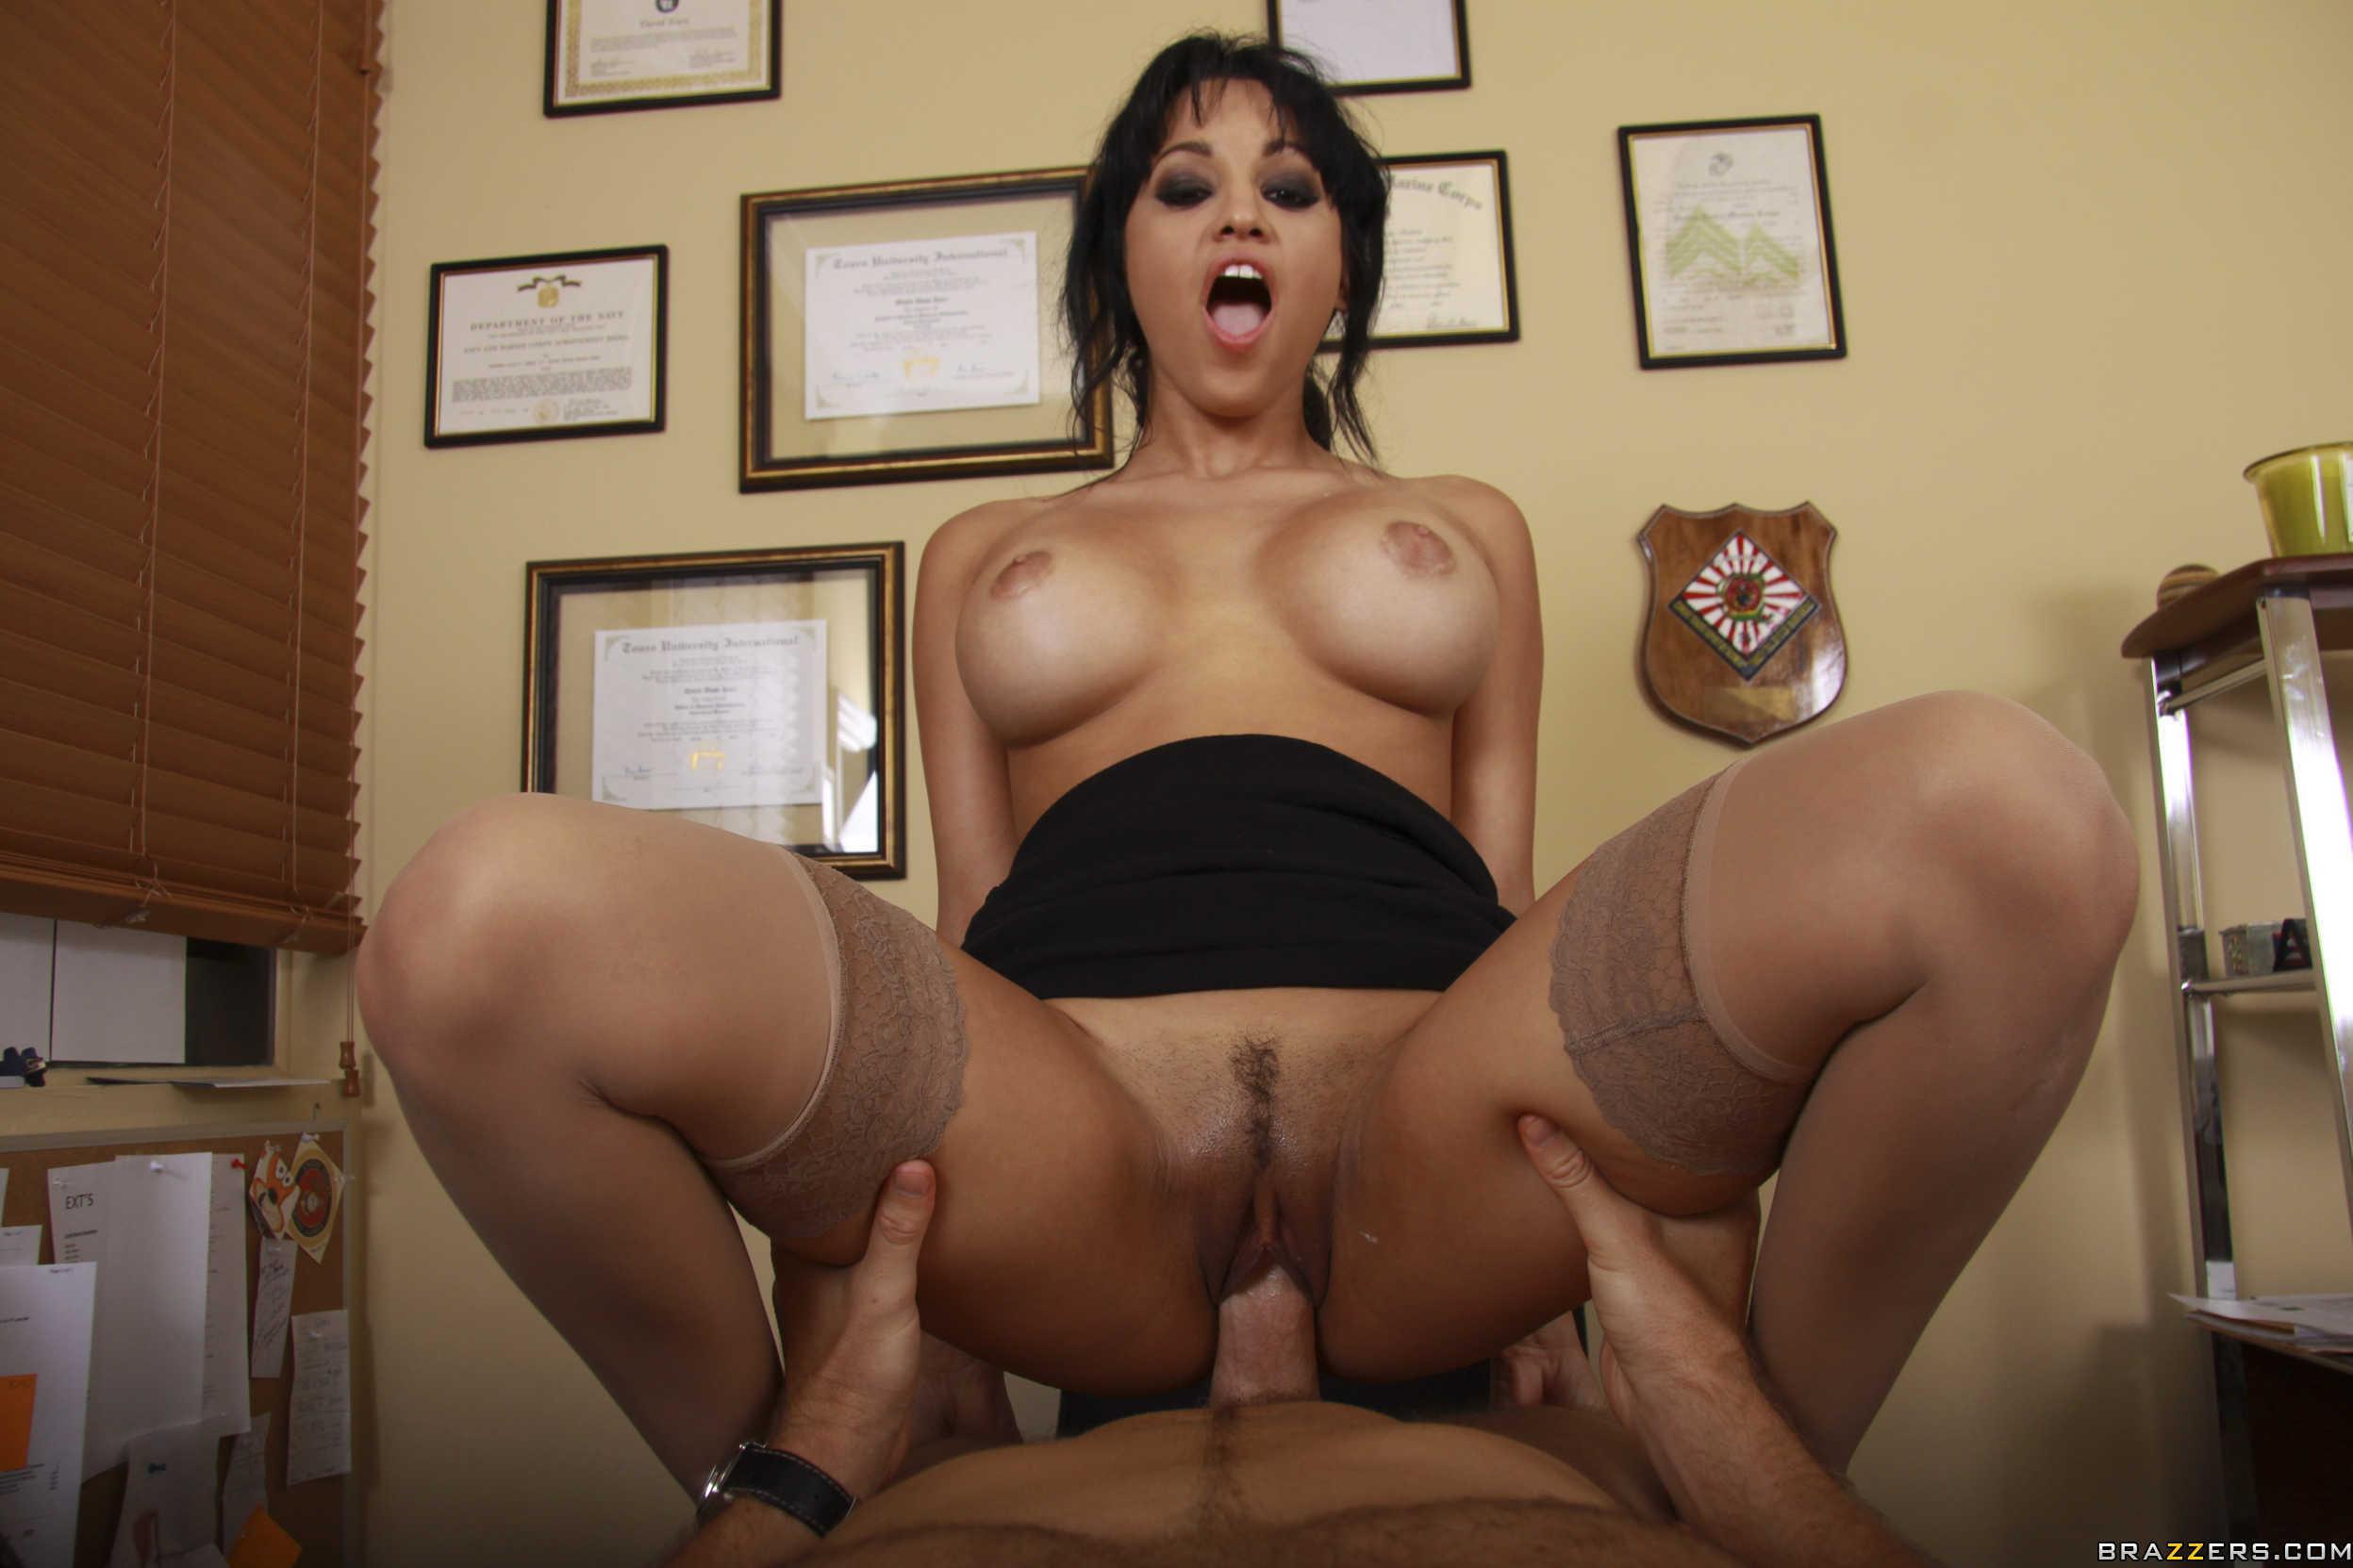 luanna latina porn tube 8